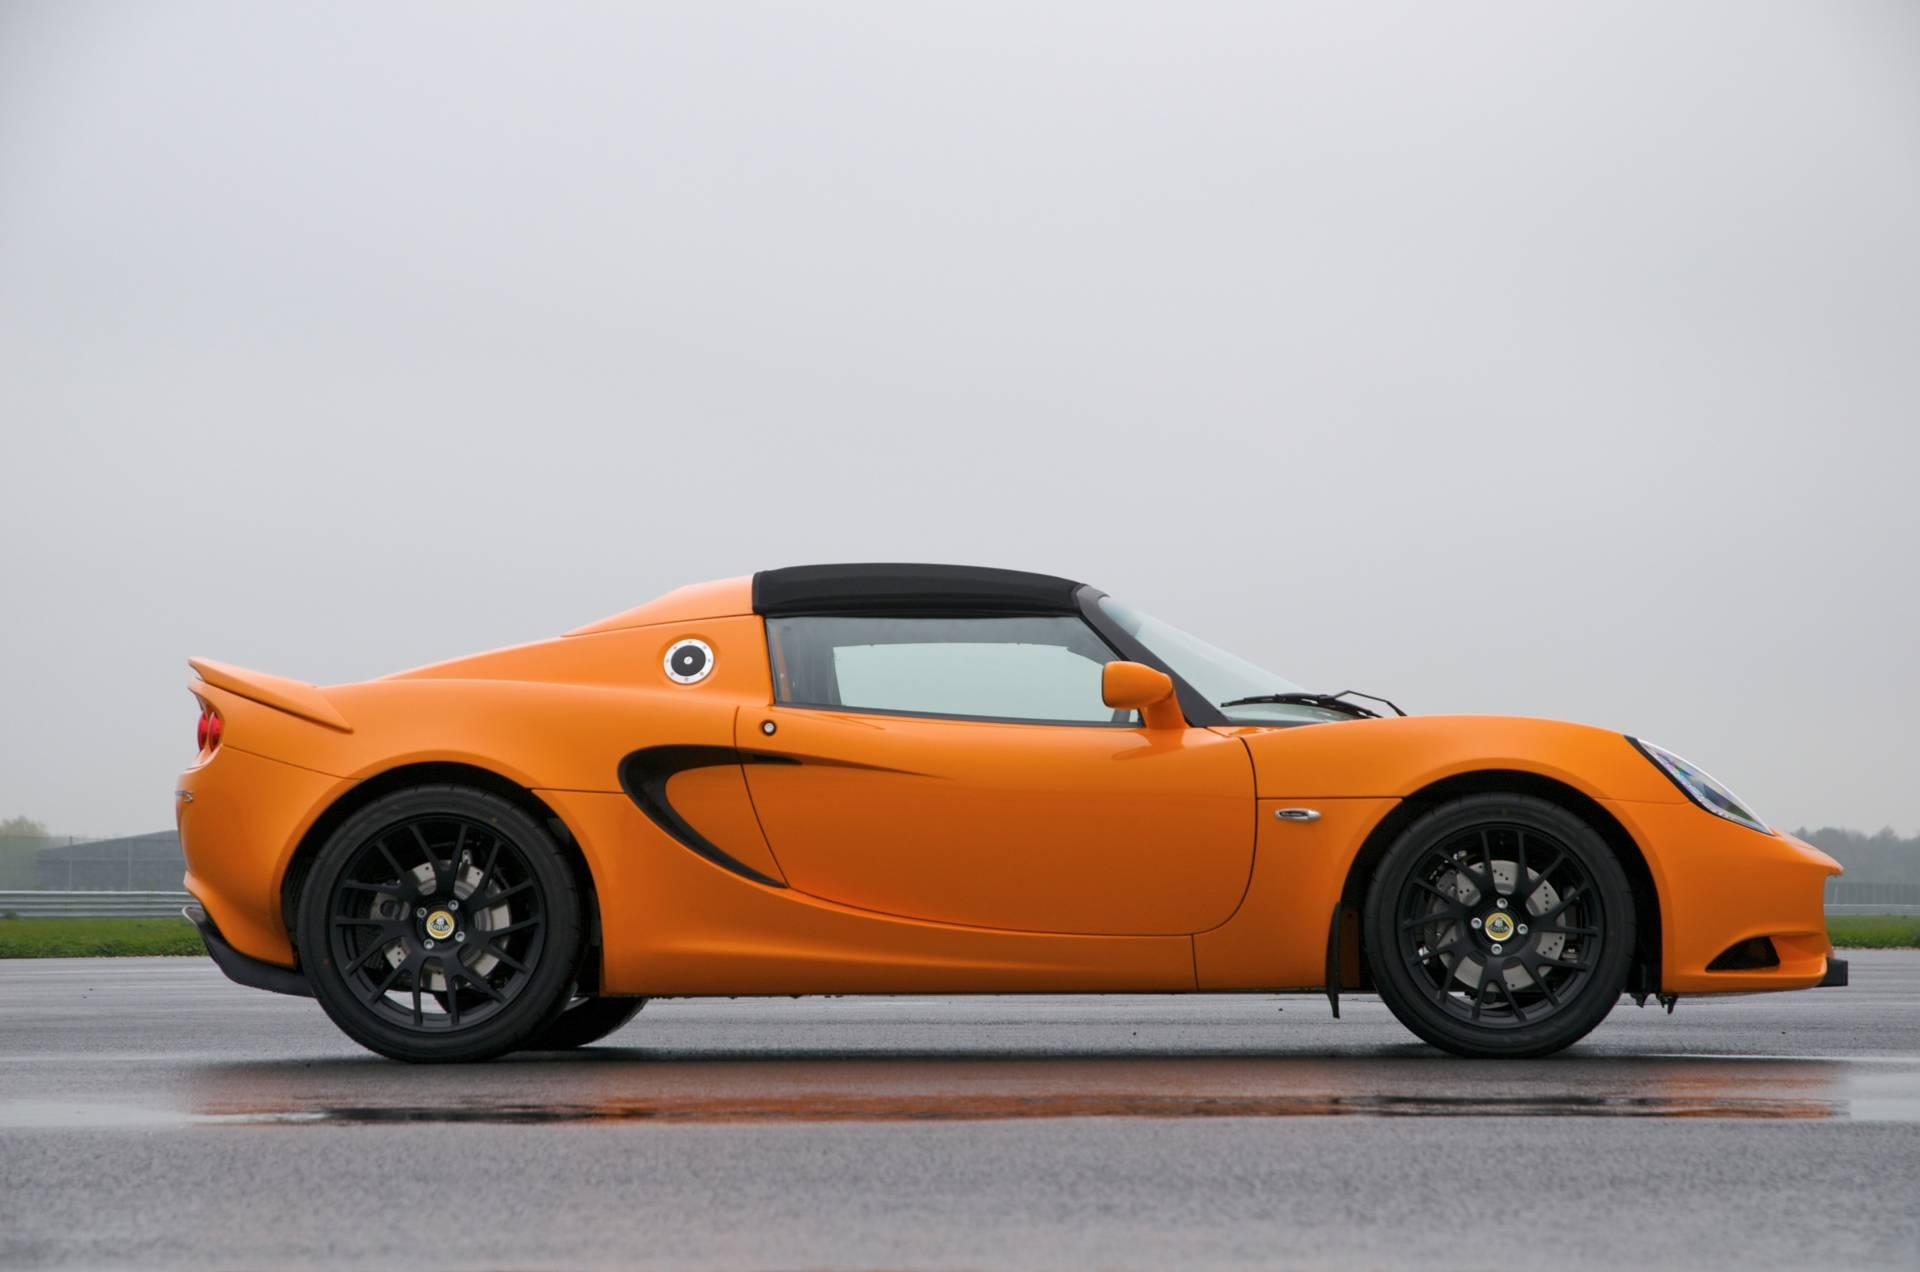 2013 lotus elise conceptcarzcom